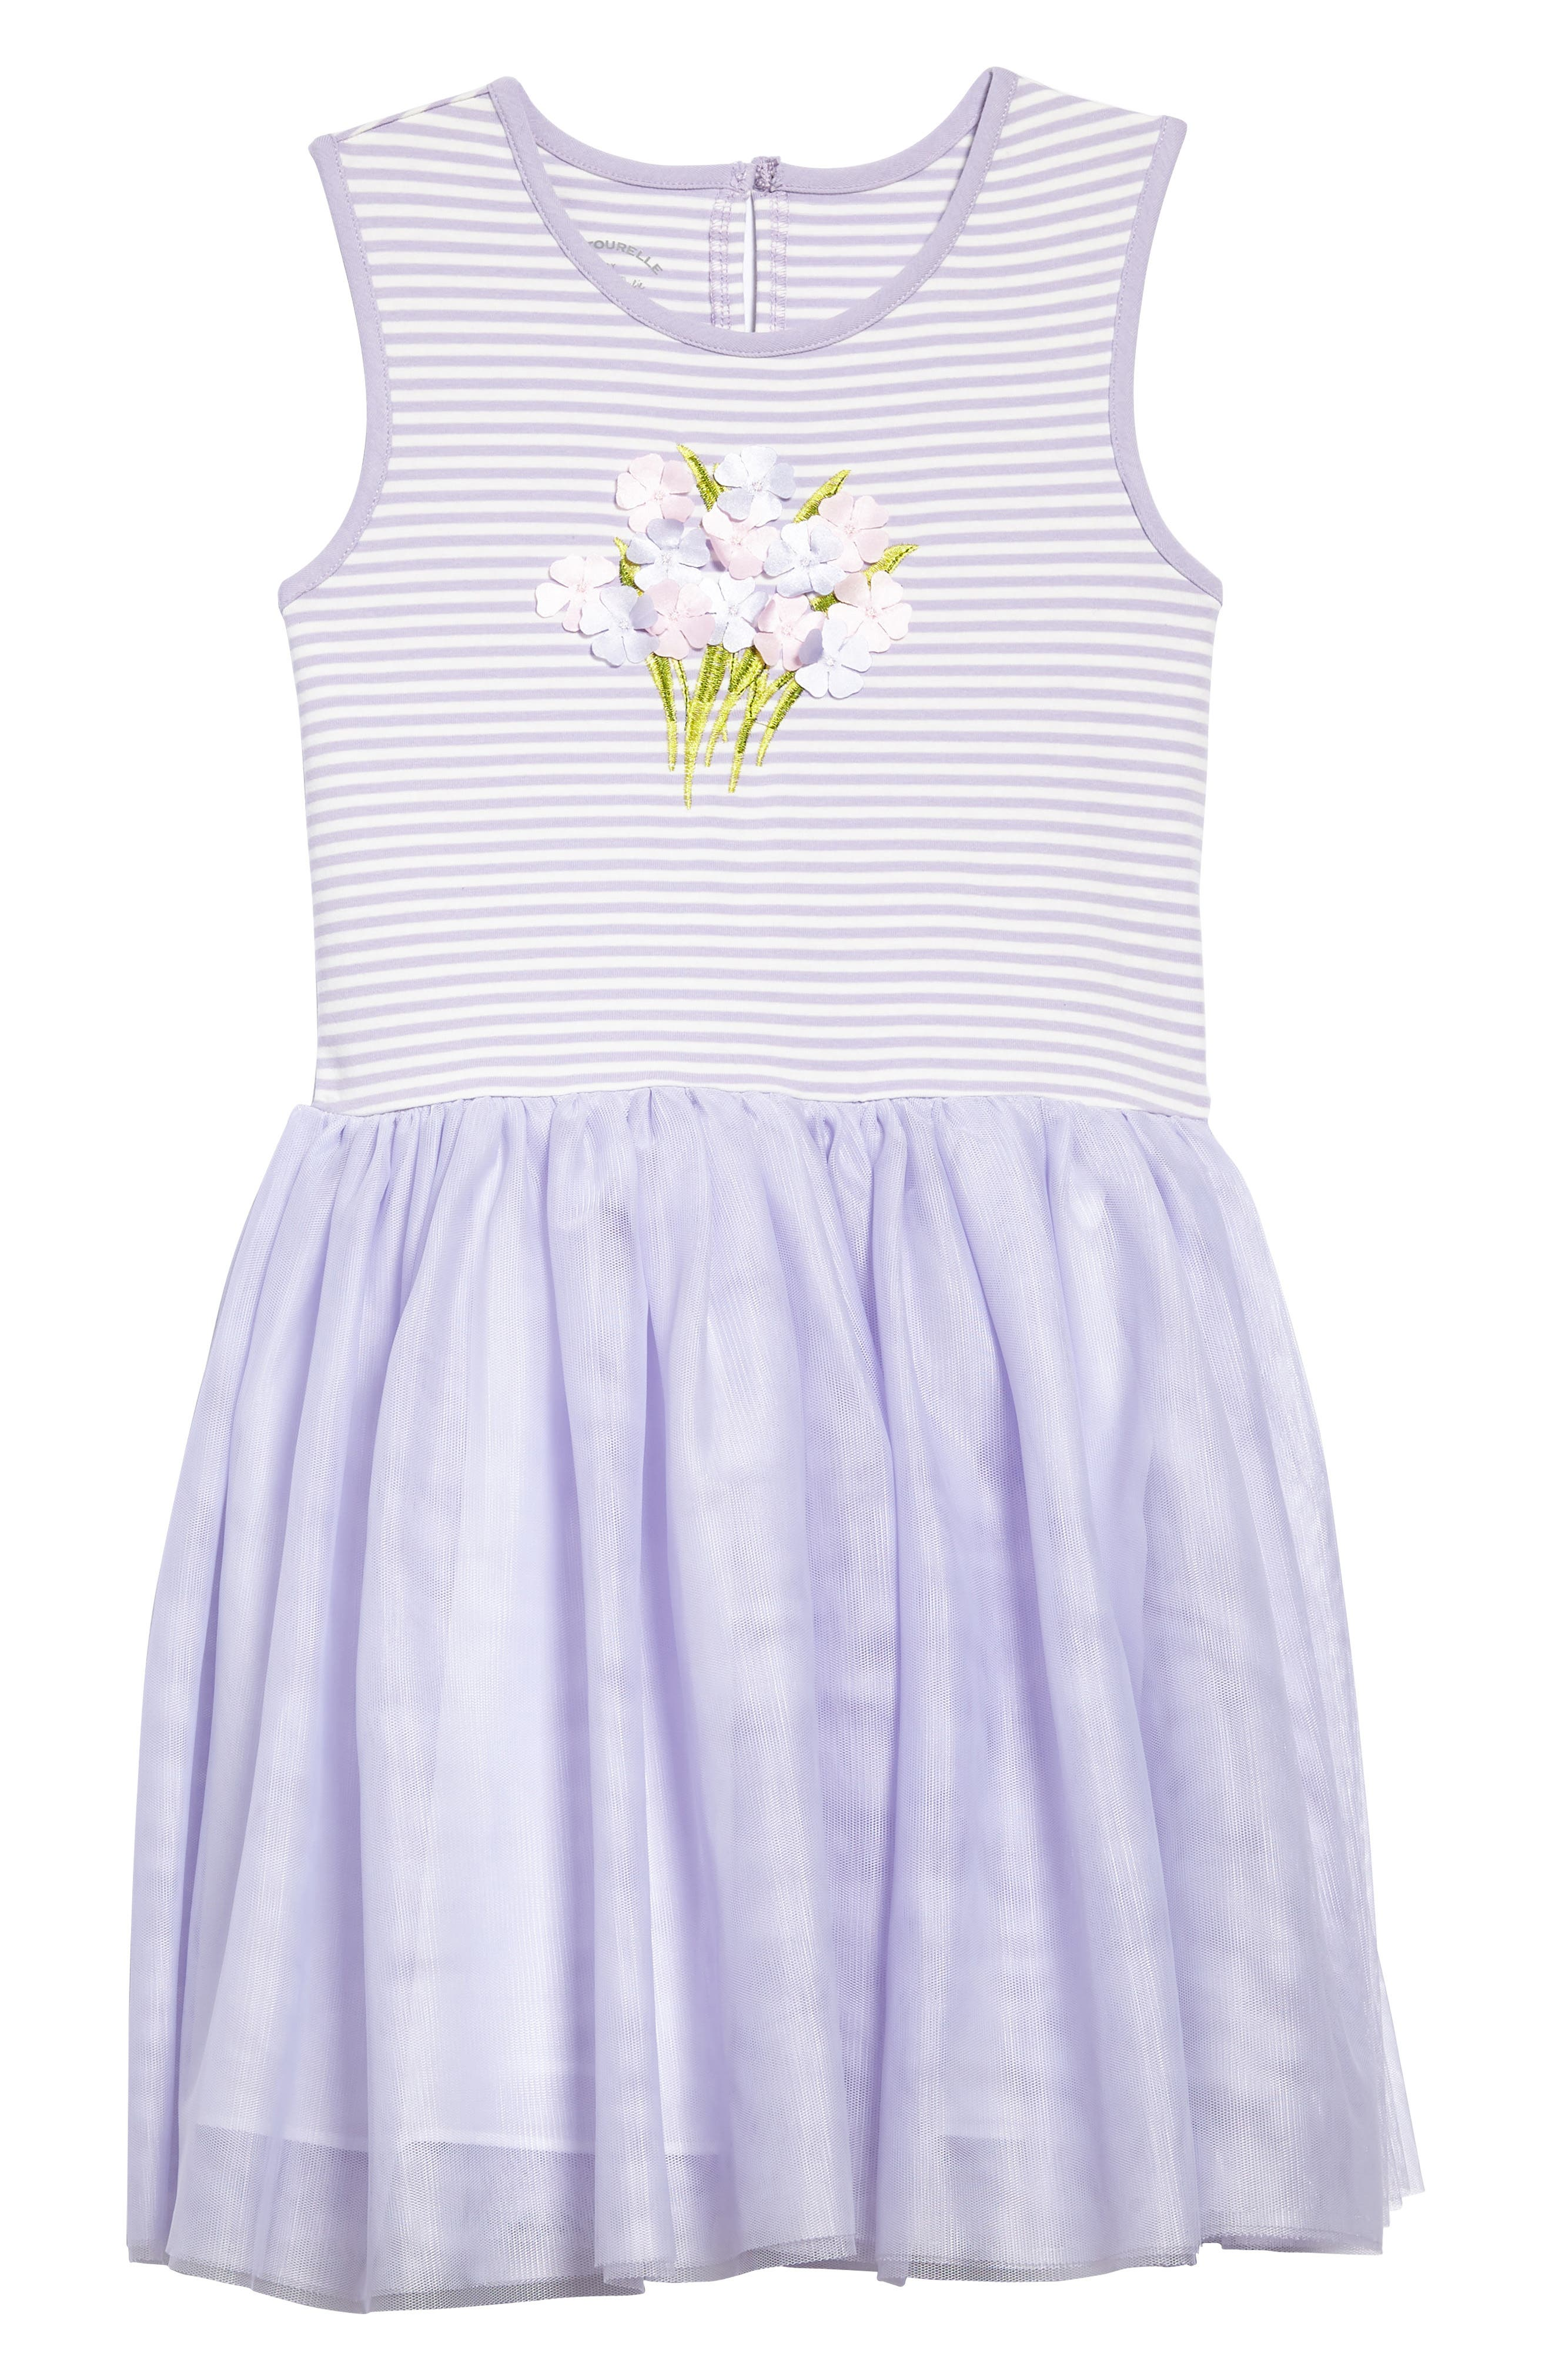 Pastourelle by Pippa & Julie Sleeveless Tutu Dress (Toddler Girls, Little Girls & Big Girls)